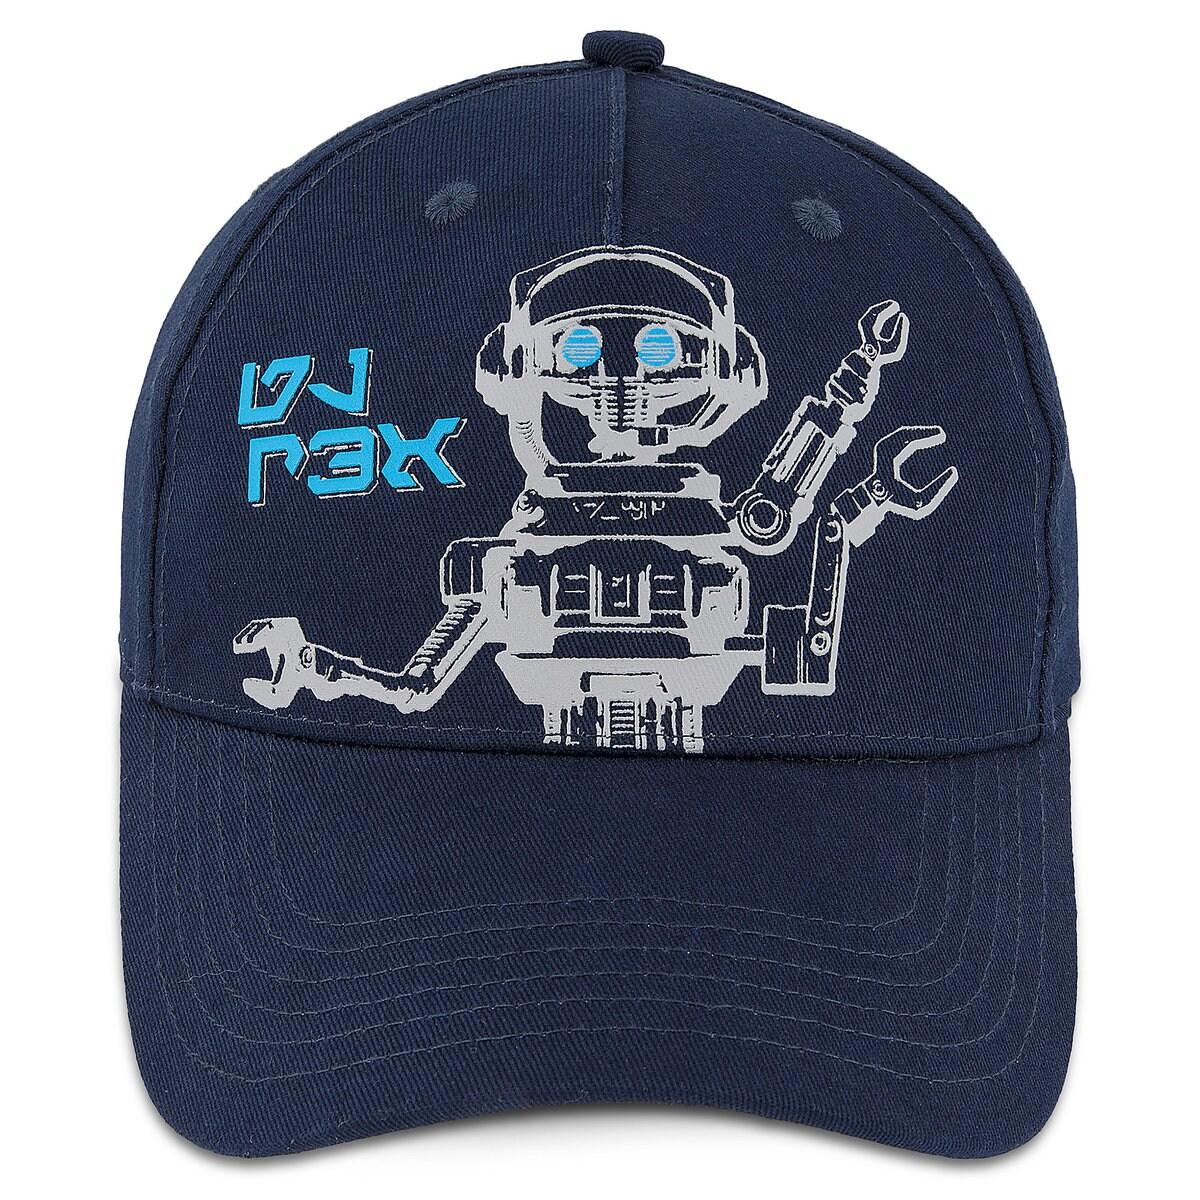 ffcbfc396 Product Image of DJ Rex Baseball Cap for Kids - Star Wars: Galaxy's Edge #